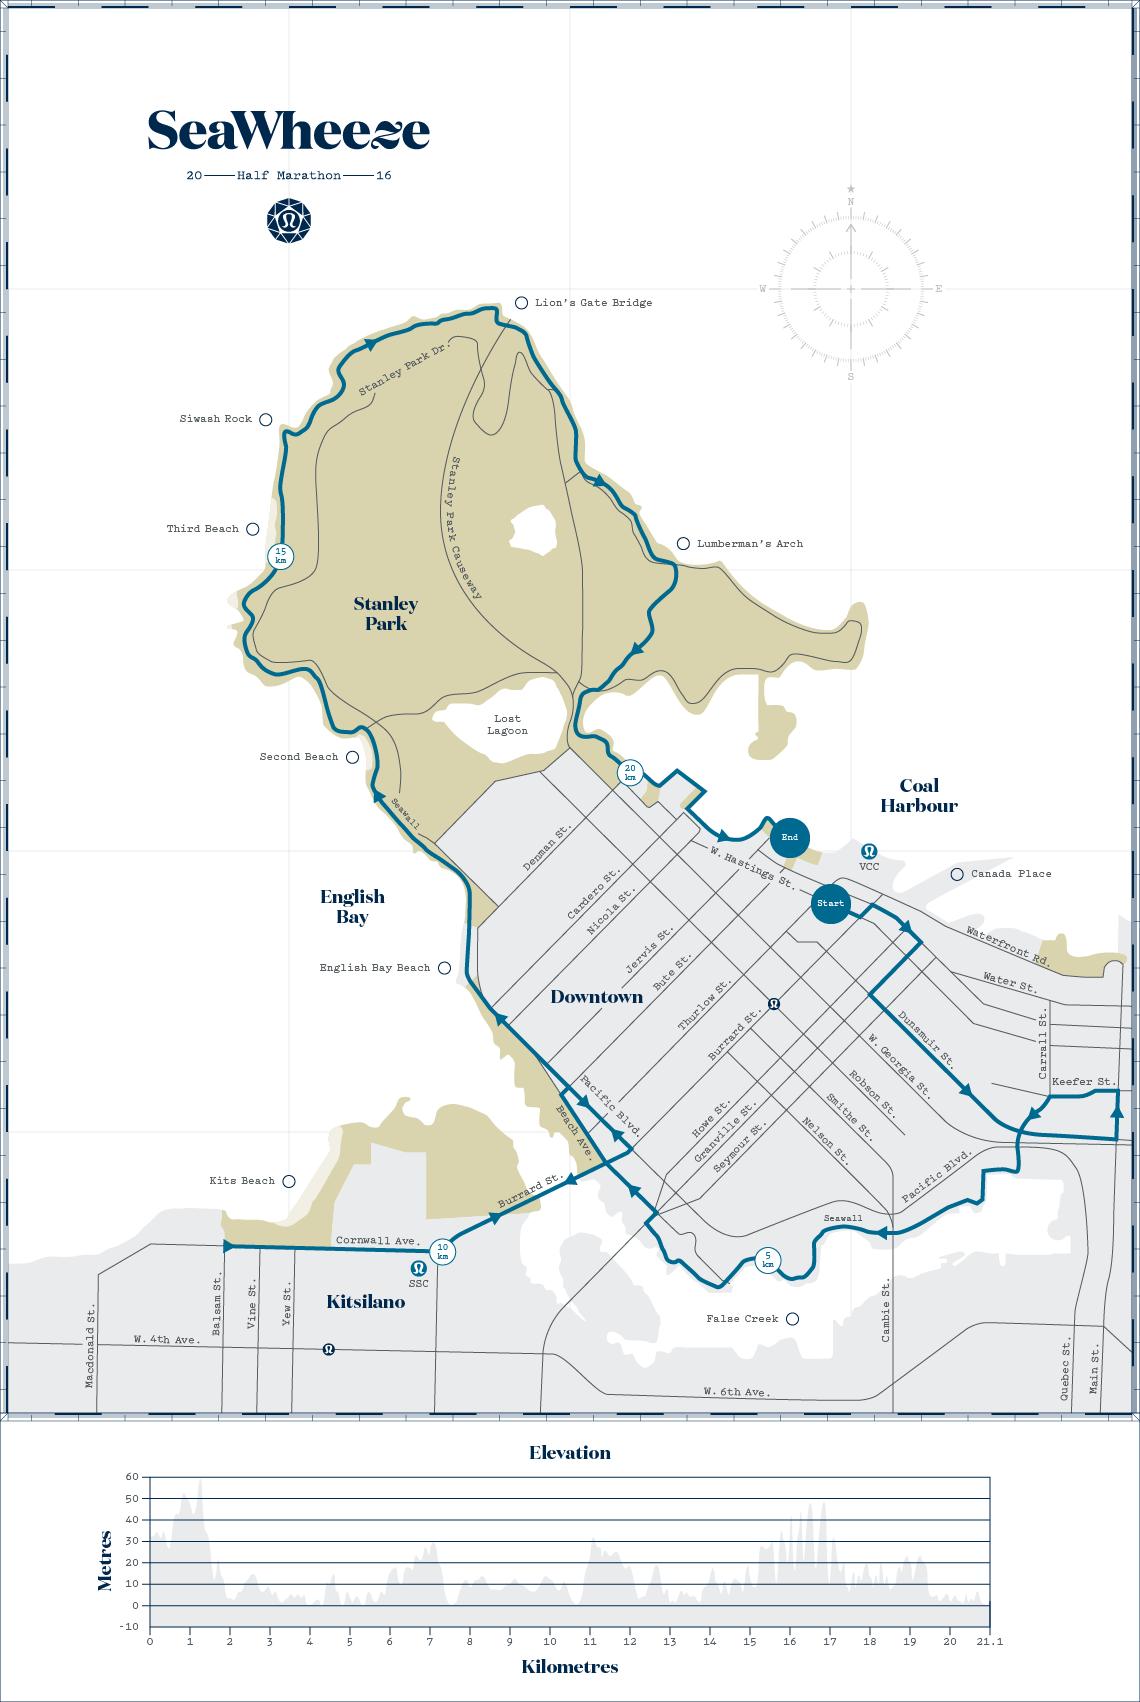 The SeaWheeze 2016 Half Marathon Route (SeaWheeze)